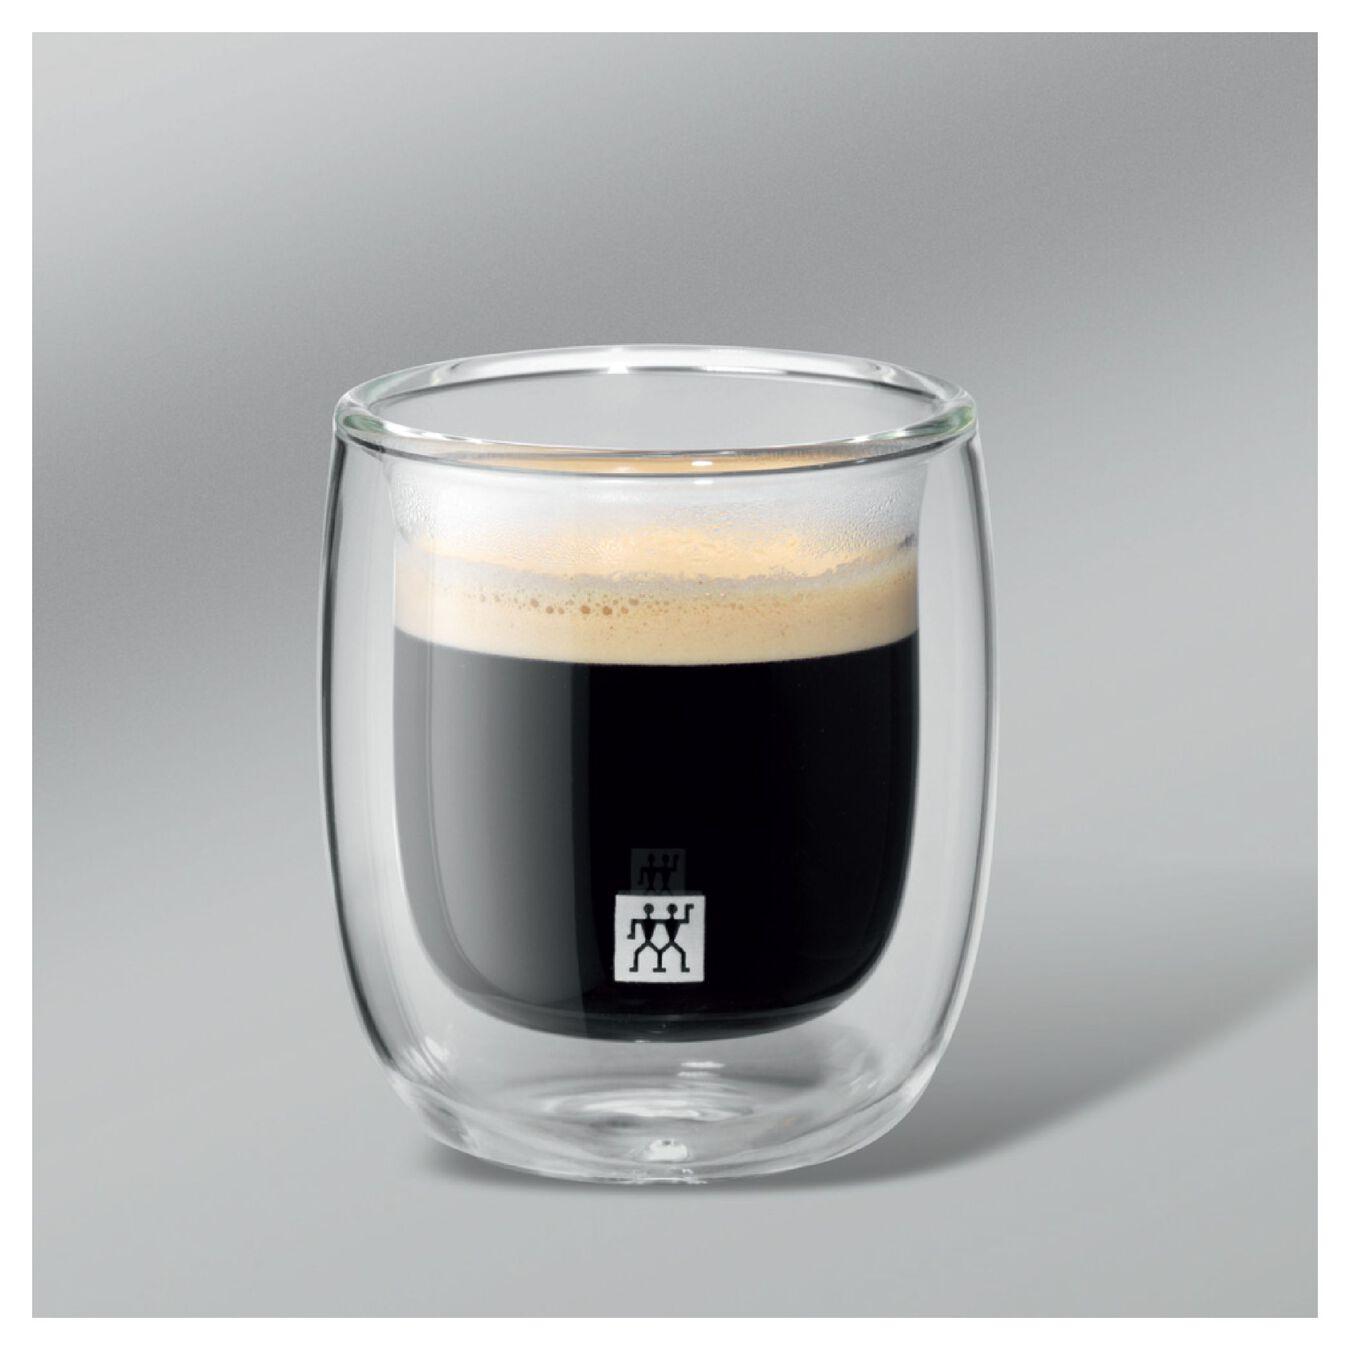 2 Piece Double-Wall Espresso Glass Set,,large 3